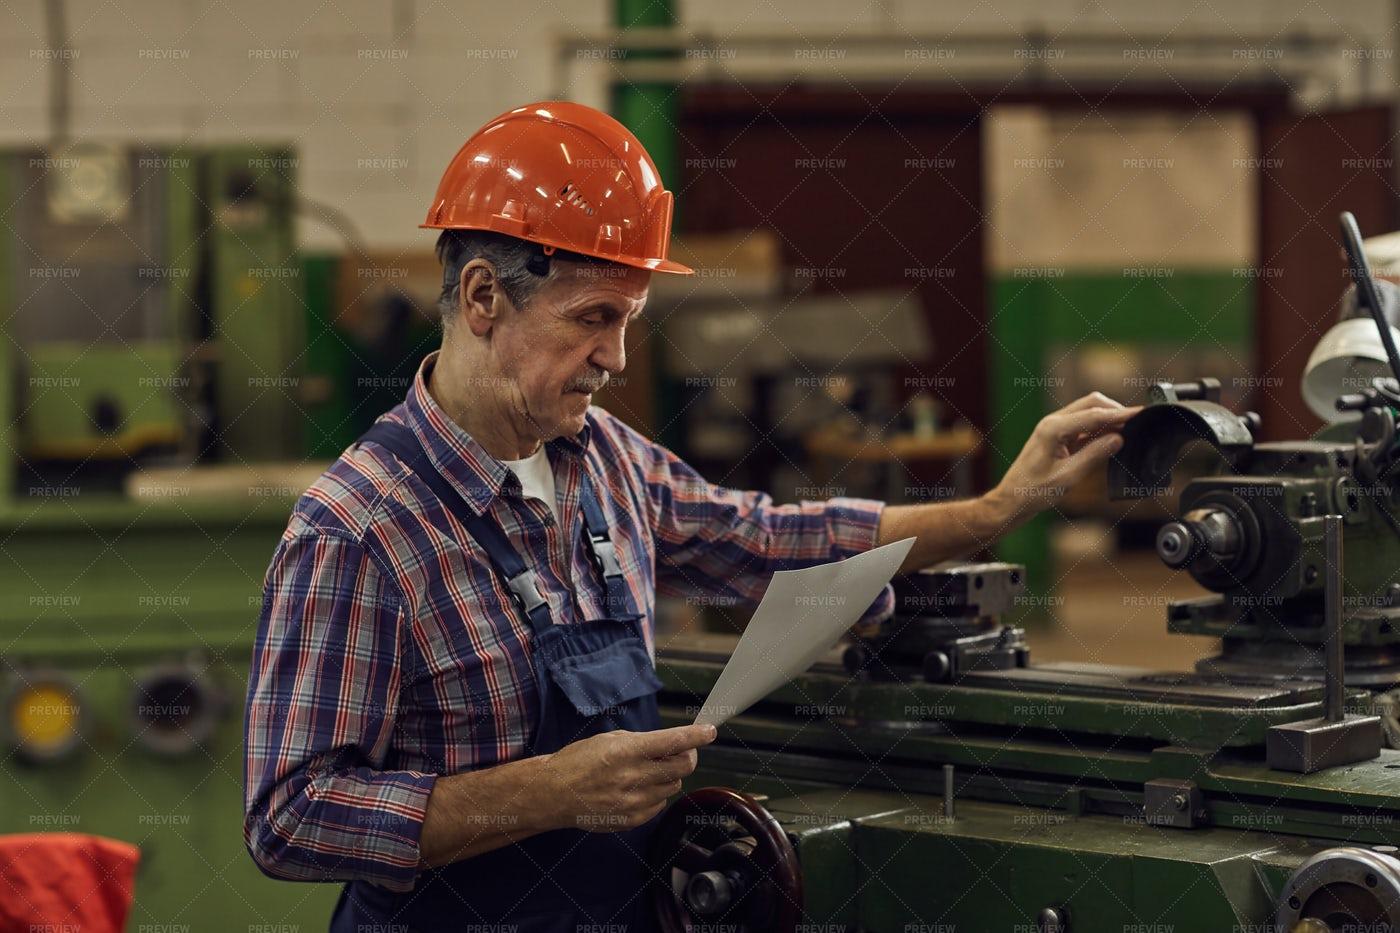 Engineer Reading Instruction: Stock Photos